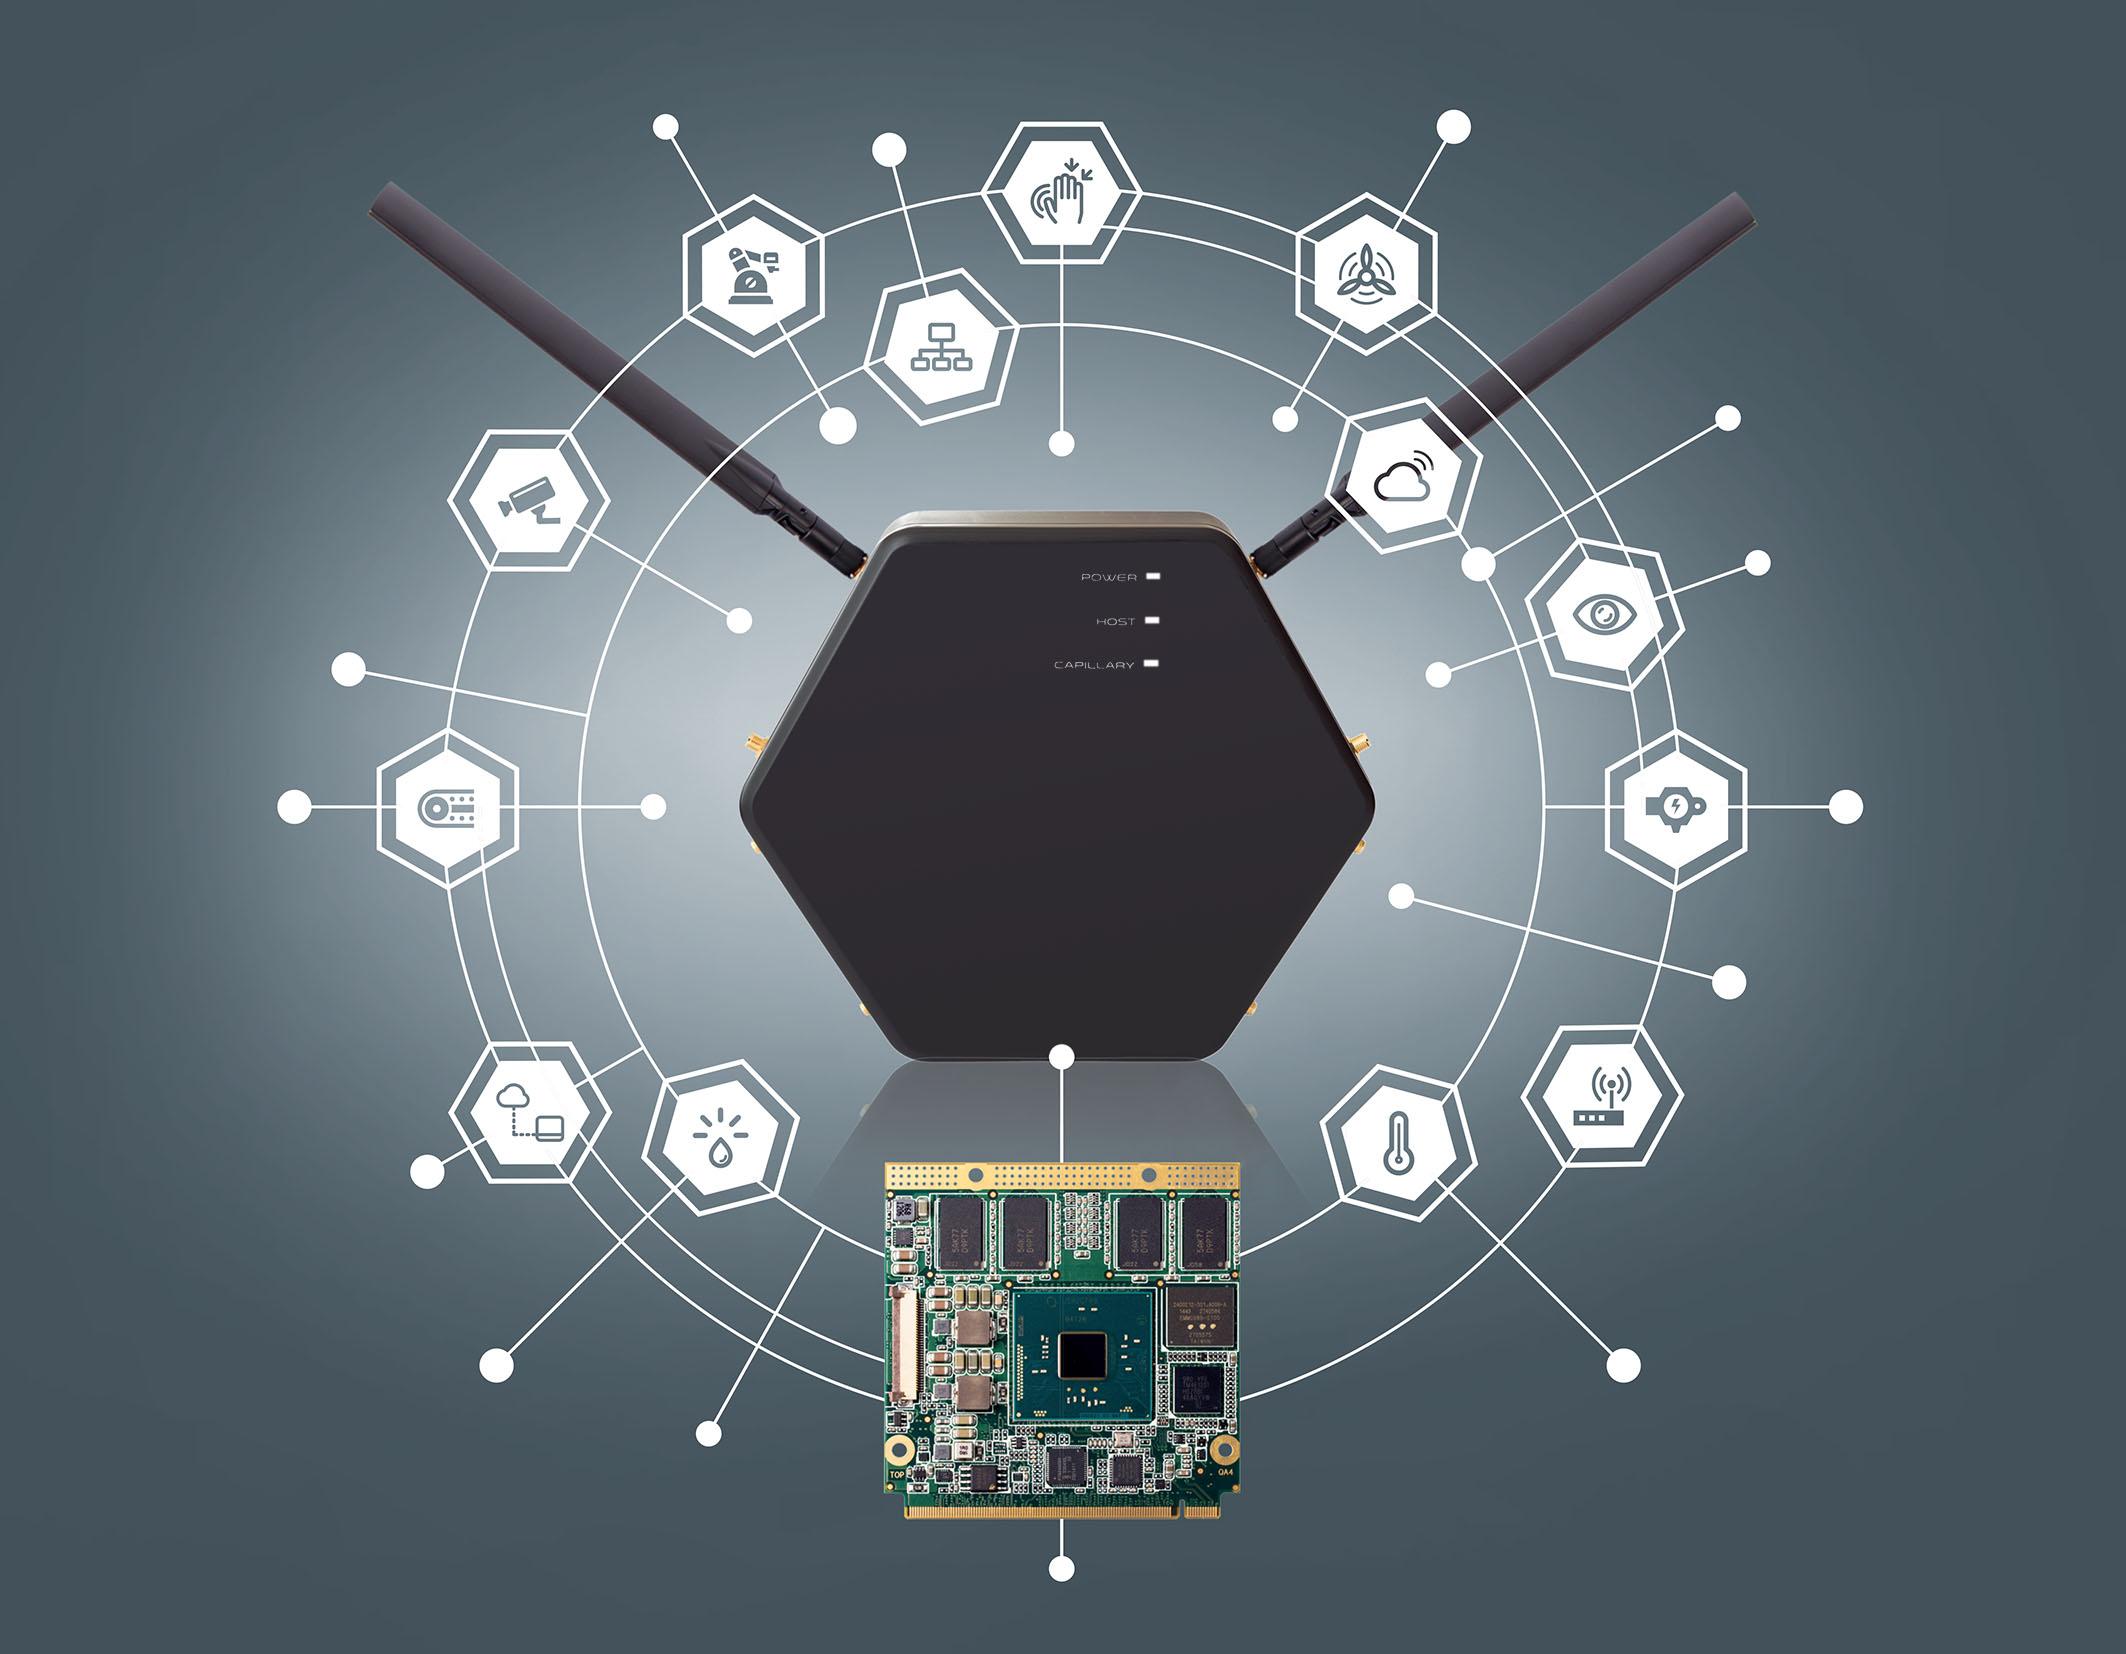 congatec IoT gateway system